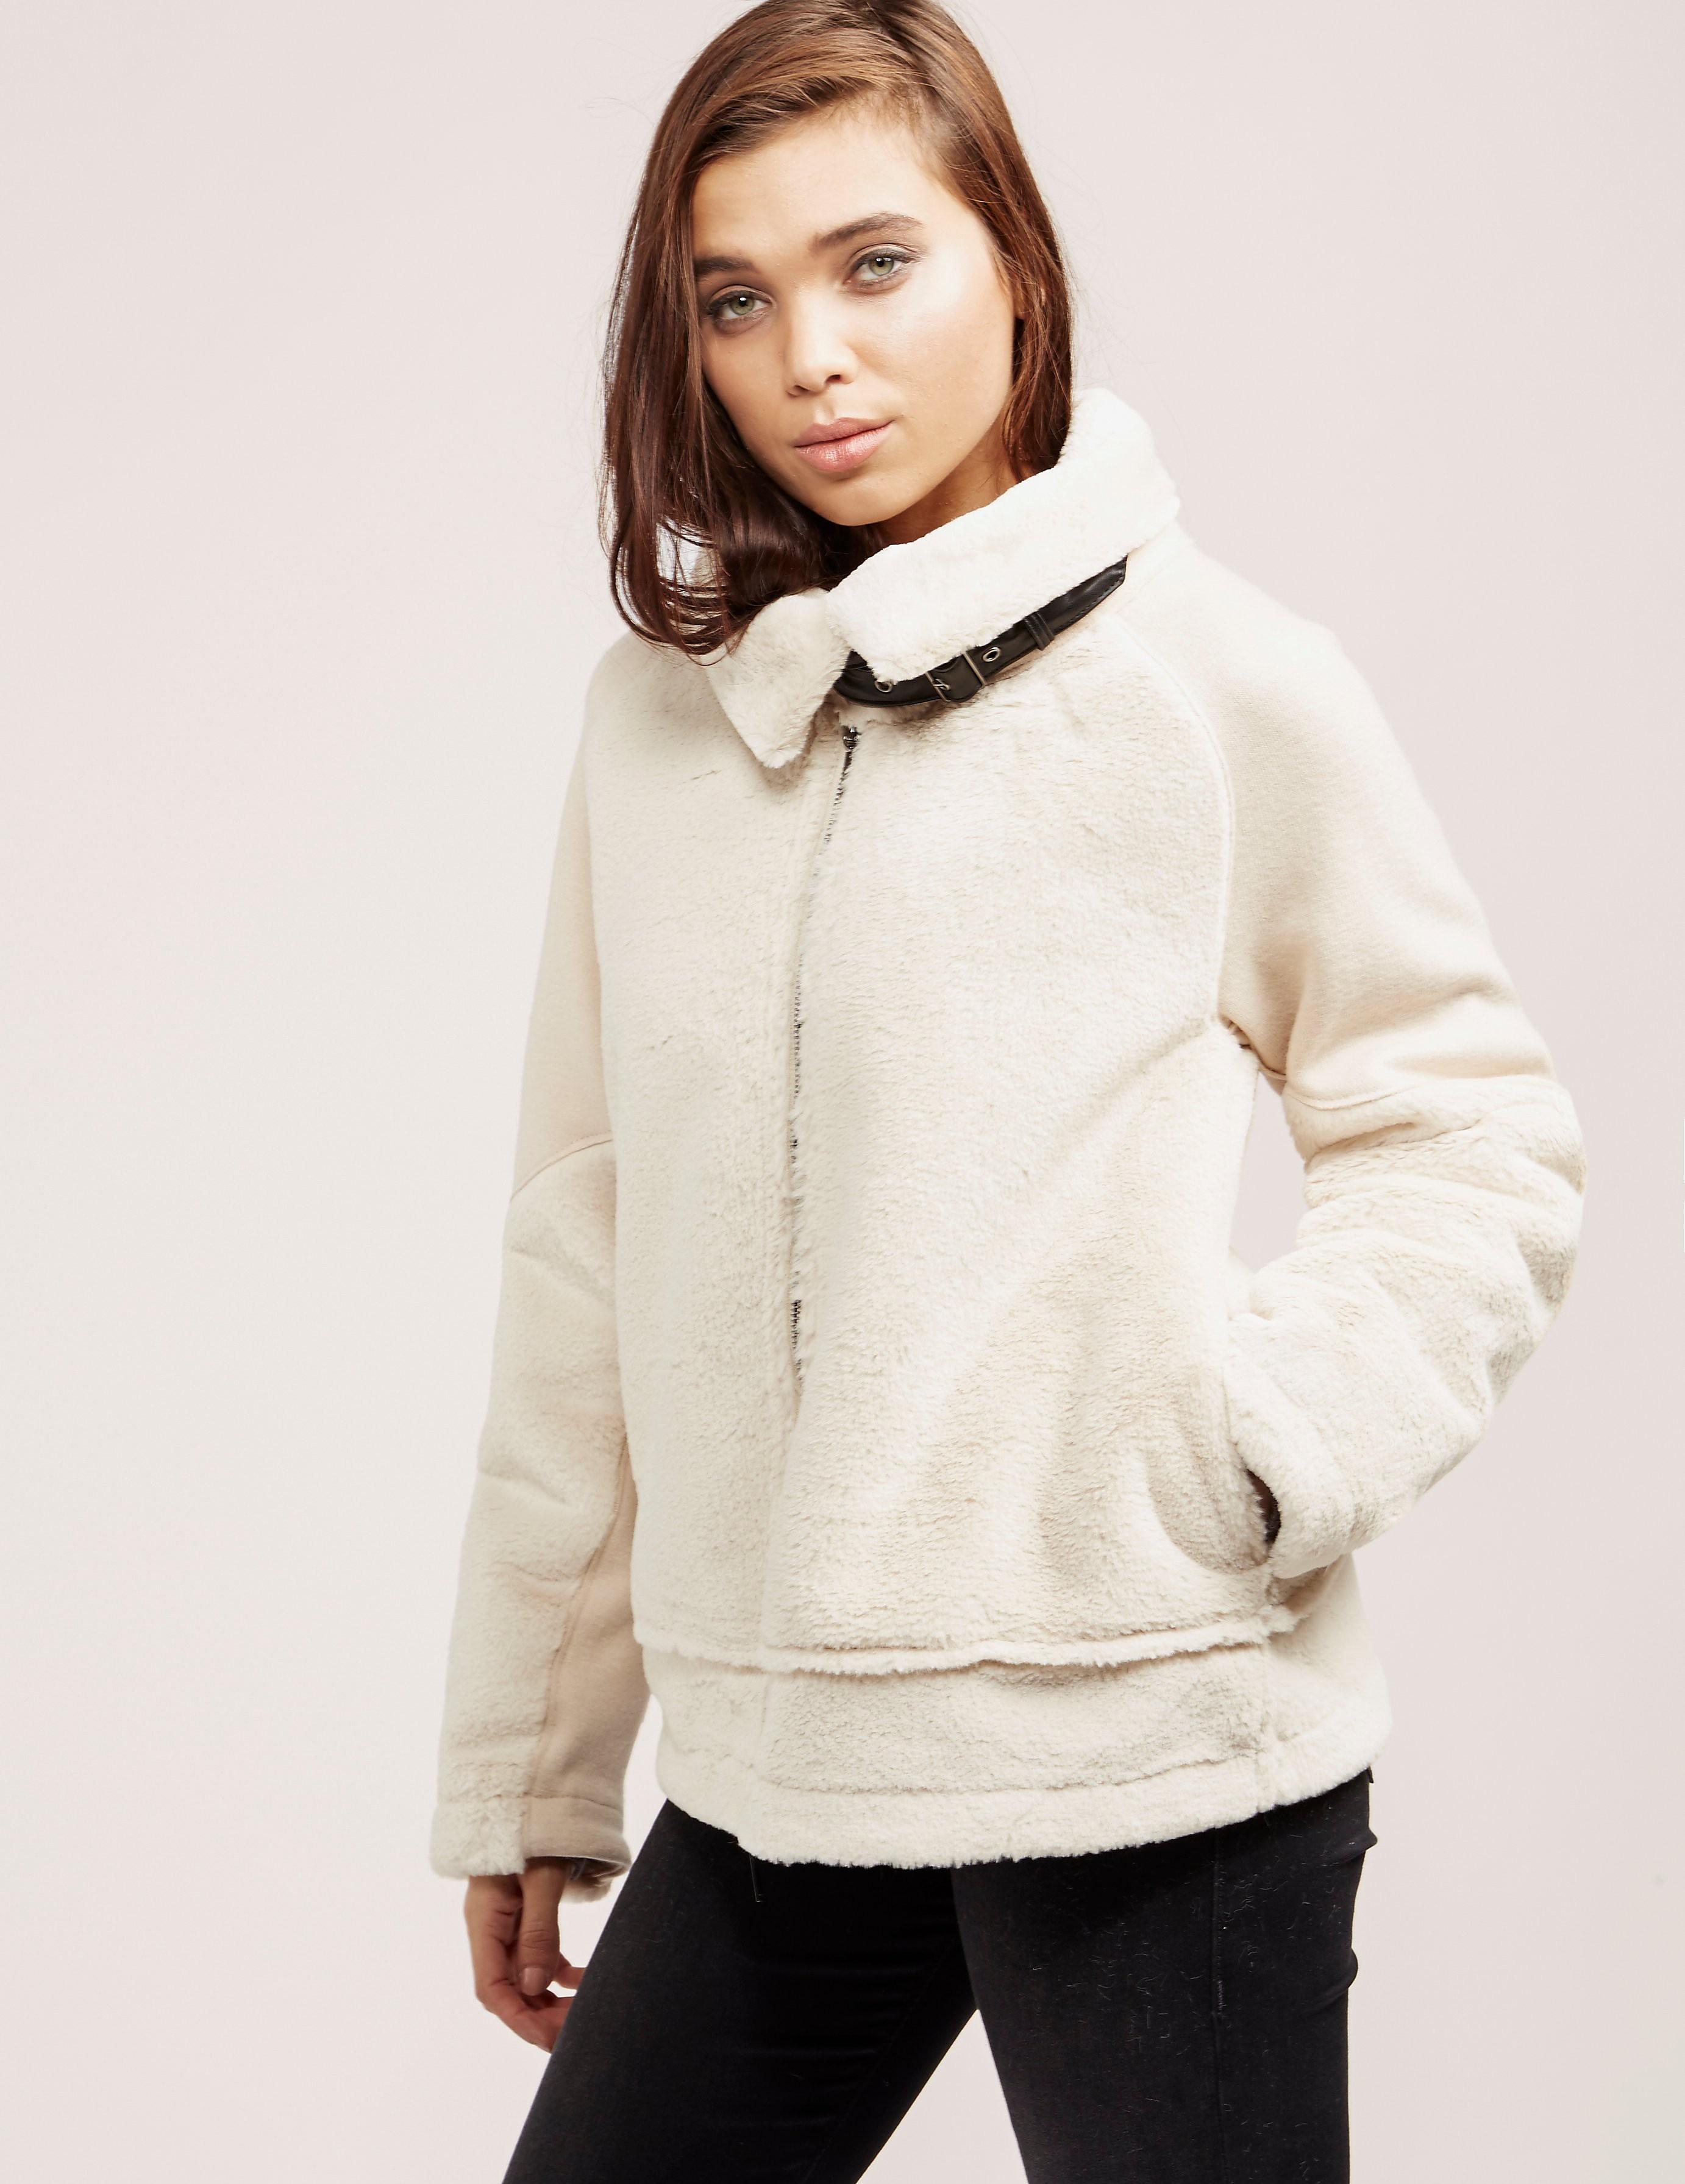 Armani Jeans Fur Bomber Jacket - Online Exclusive